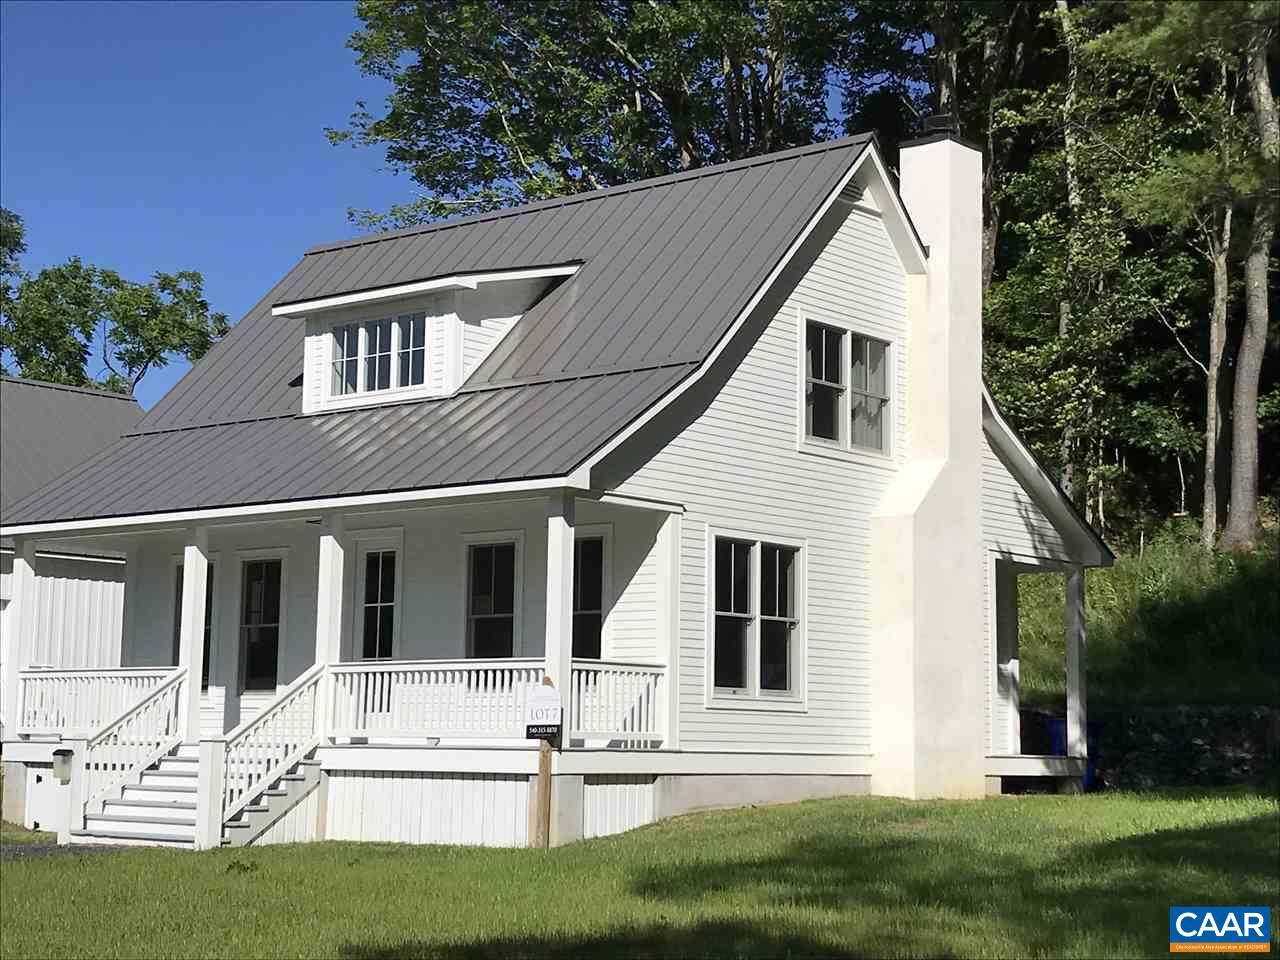 VWSF US HWY 220 Lot 7 - Madison Cottage, WARM SPRINGS, VA 24484